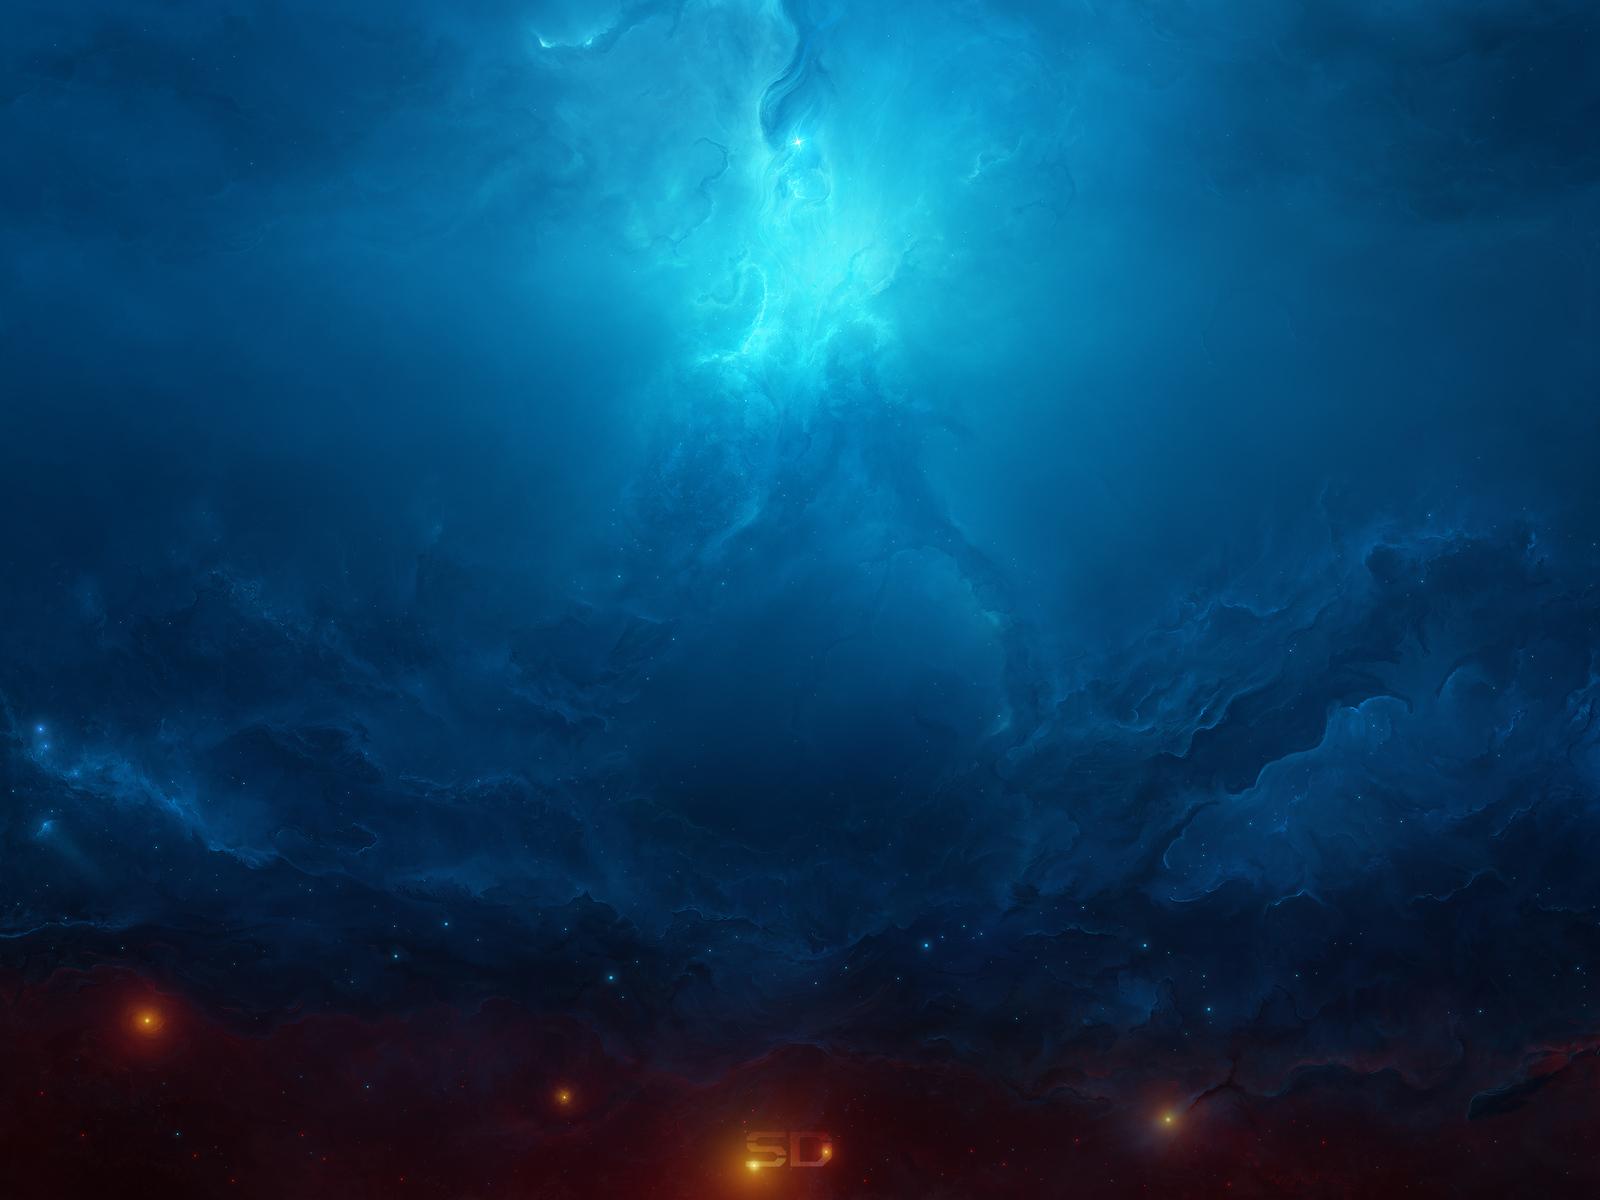 5k-nebula-digital-universe-d9.jpg